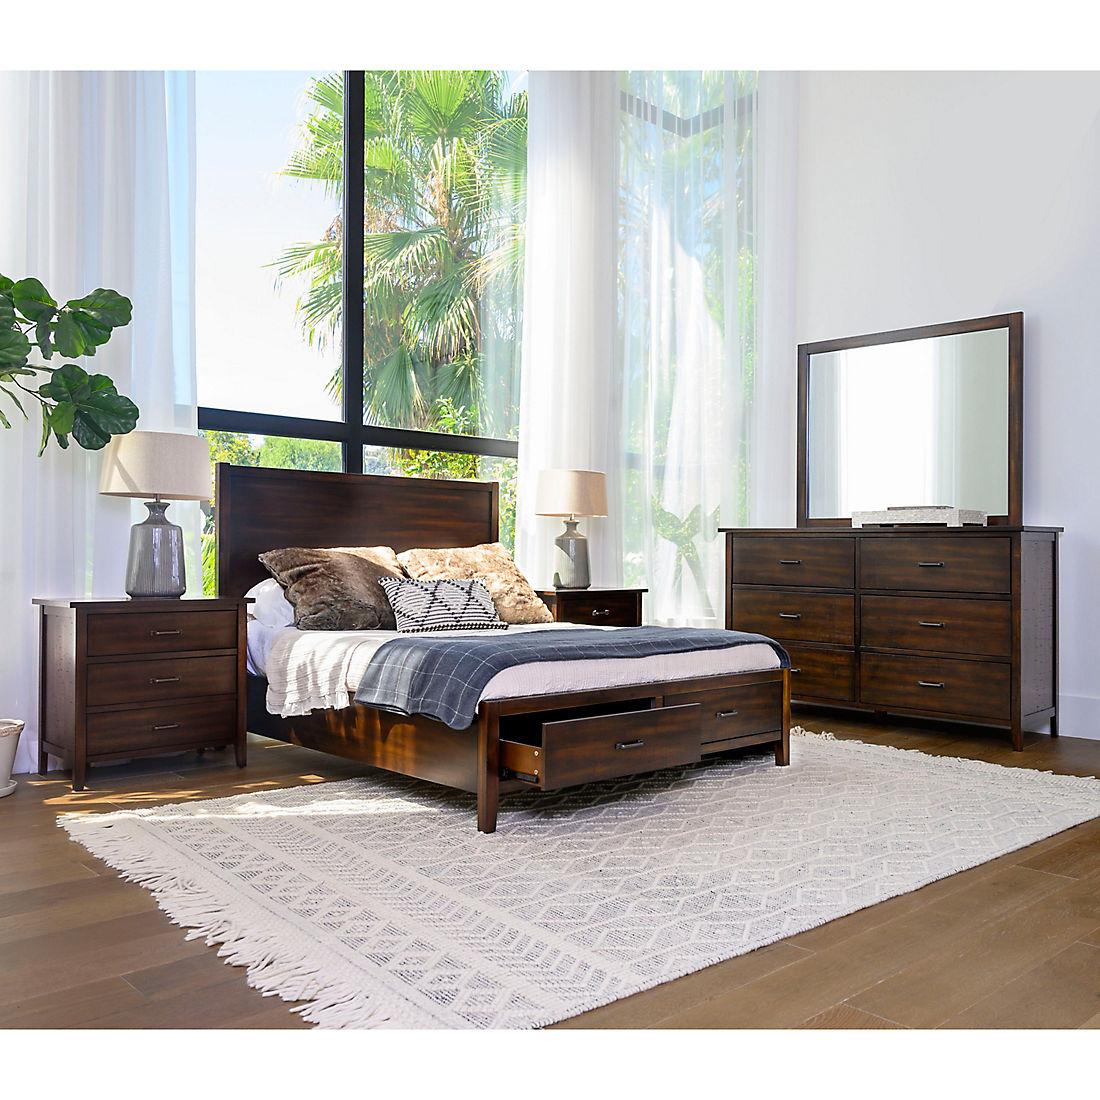 Beau Abbyson Living Lakewood 5 Pc. Bedroom Set   King